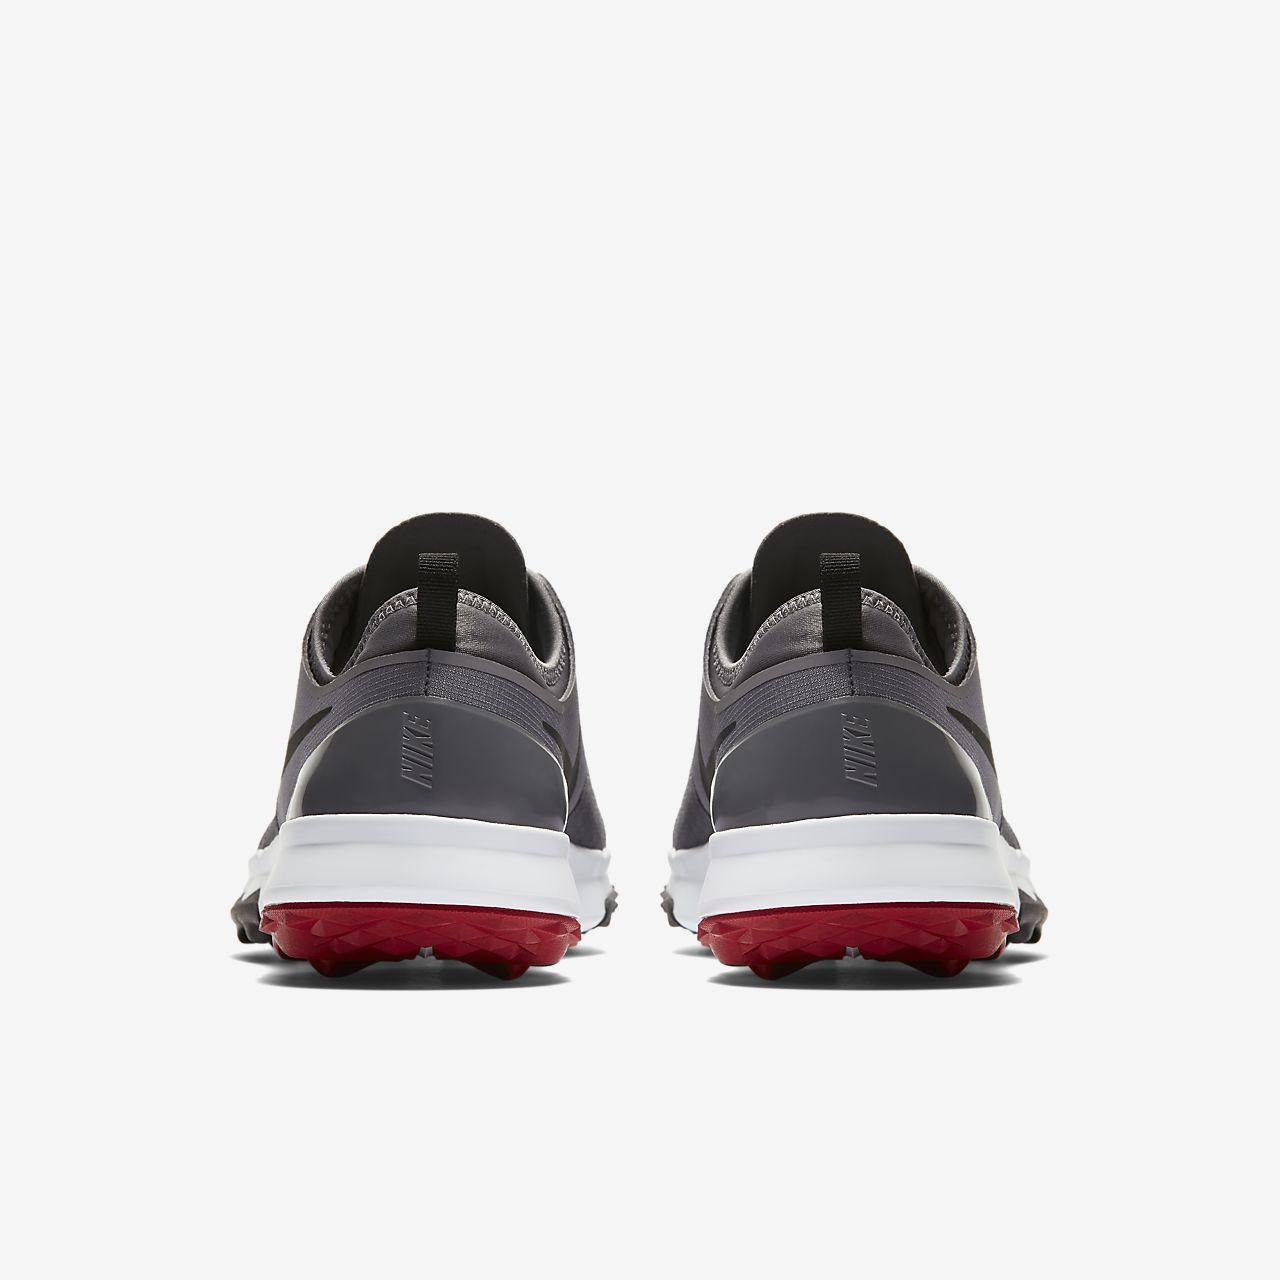 low priced 305e0 3db79 ... Golfsko Nike FI Impact 3 för män